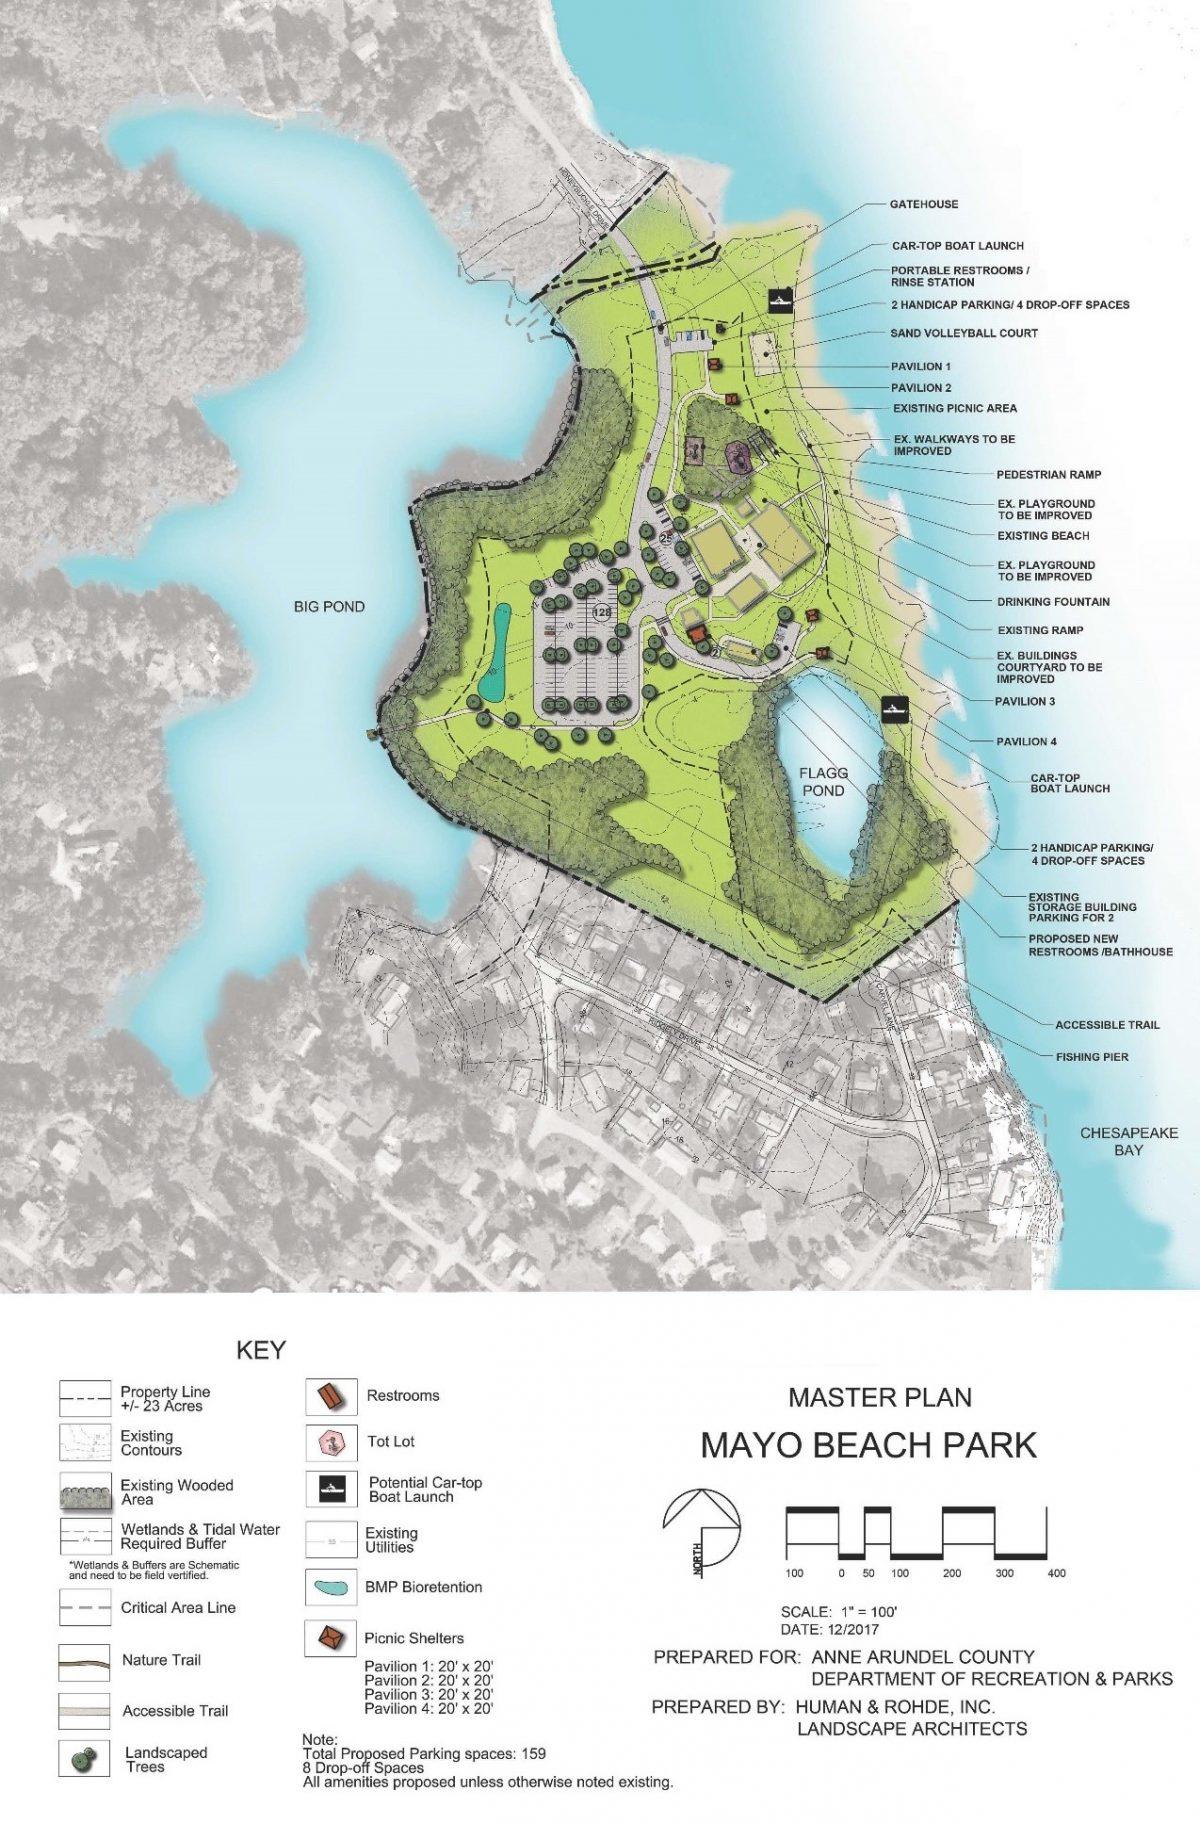 Mayo Beach Park